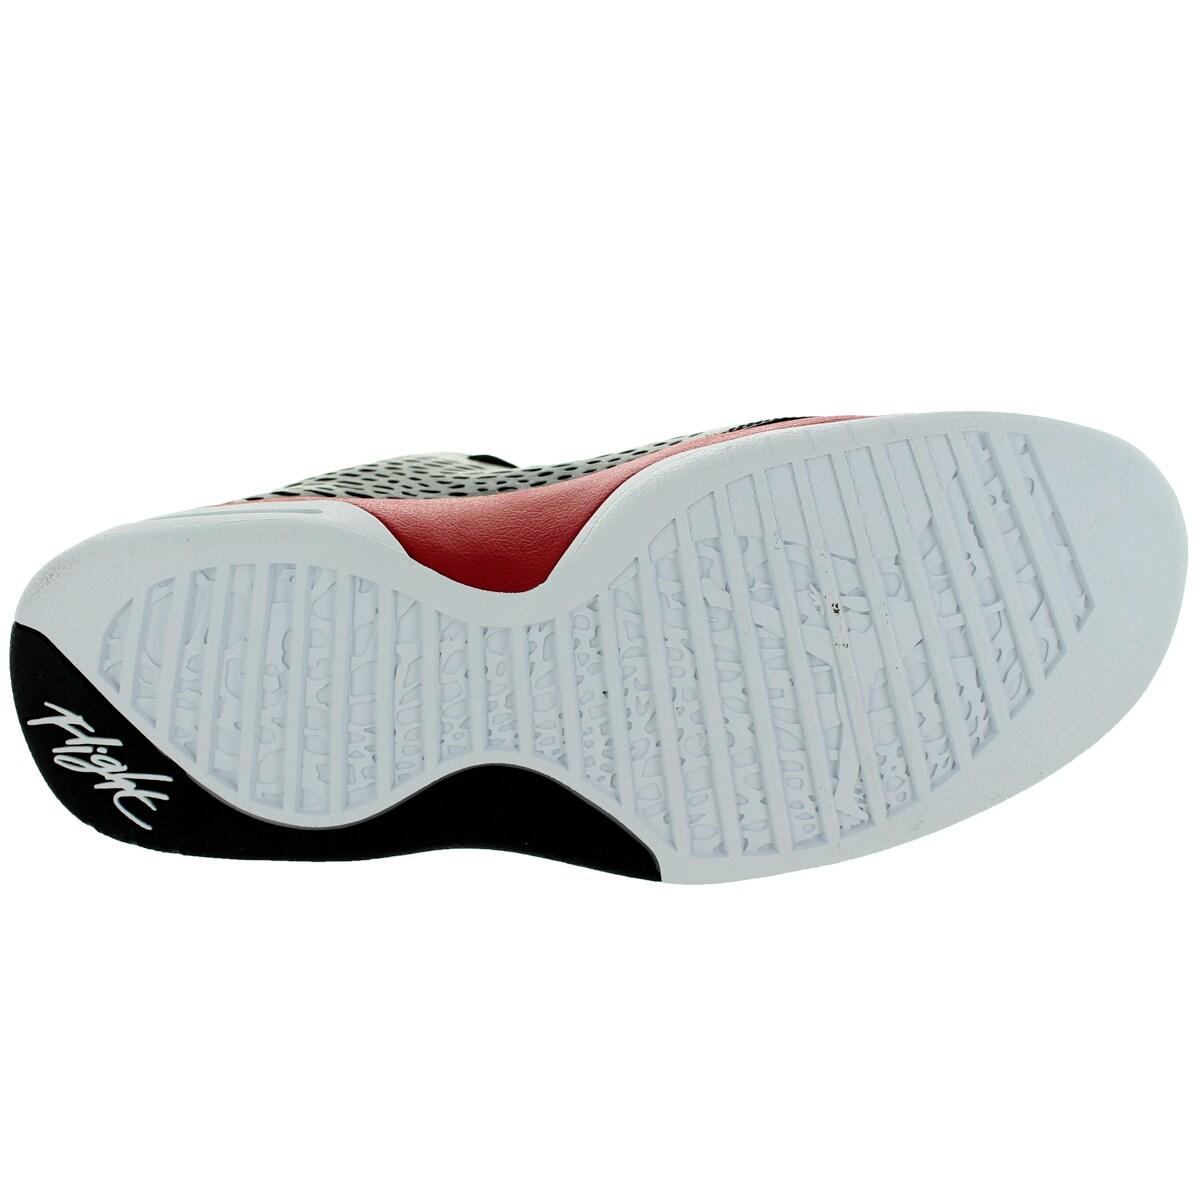 1adf580abb49 Shop Nike Jordan Men s Jordan Flight 2015 Black White Gym Red Basketball  Shoe - Free Shipping Today - Overstock - 12318462